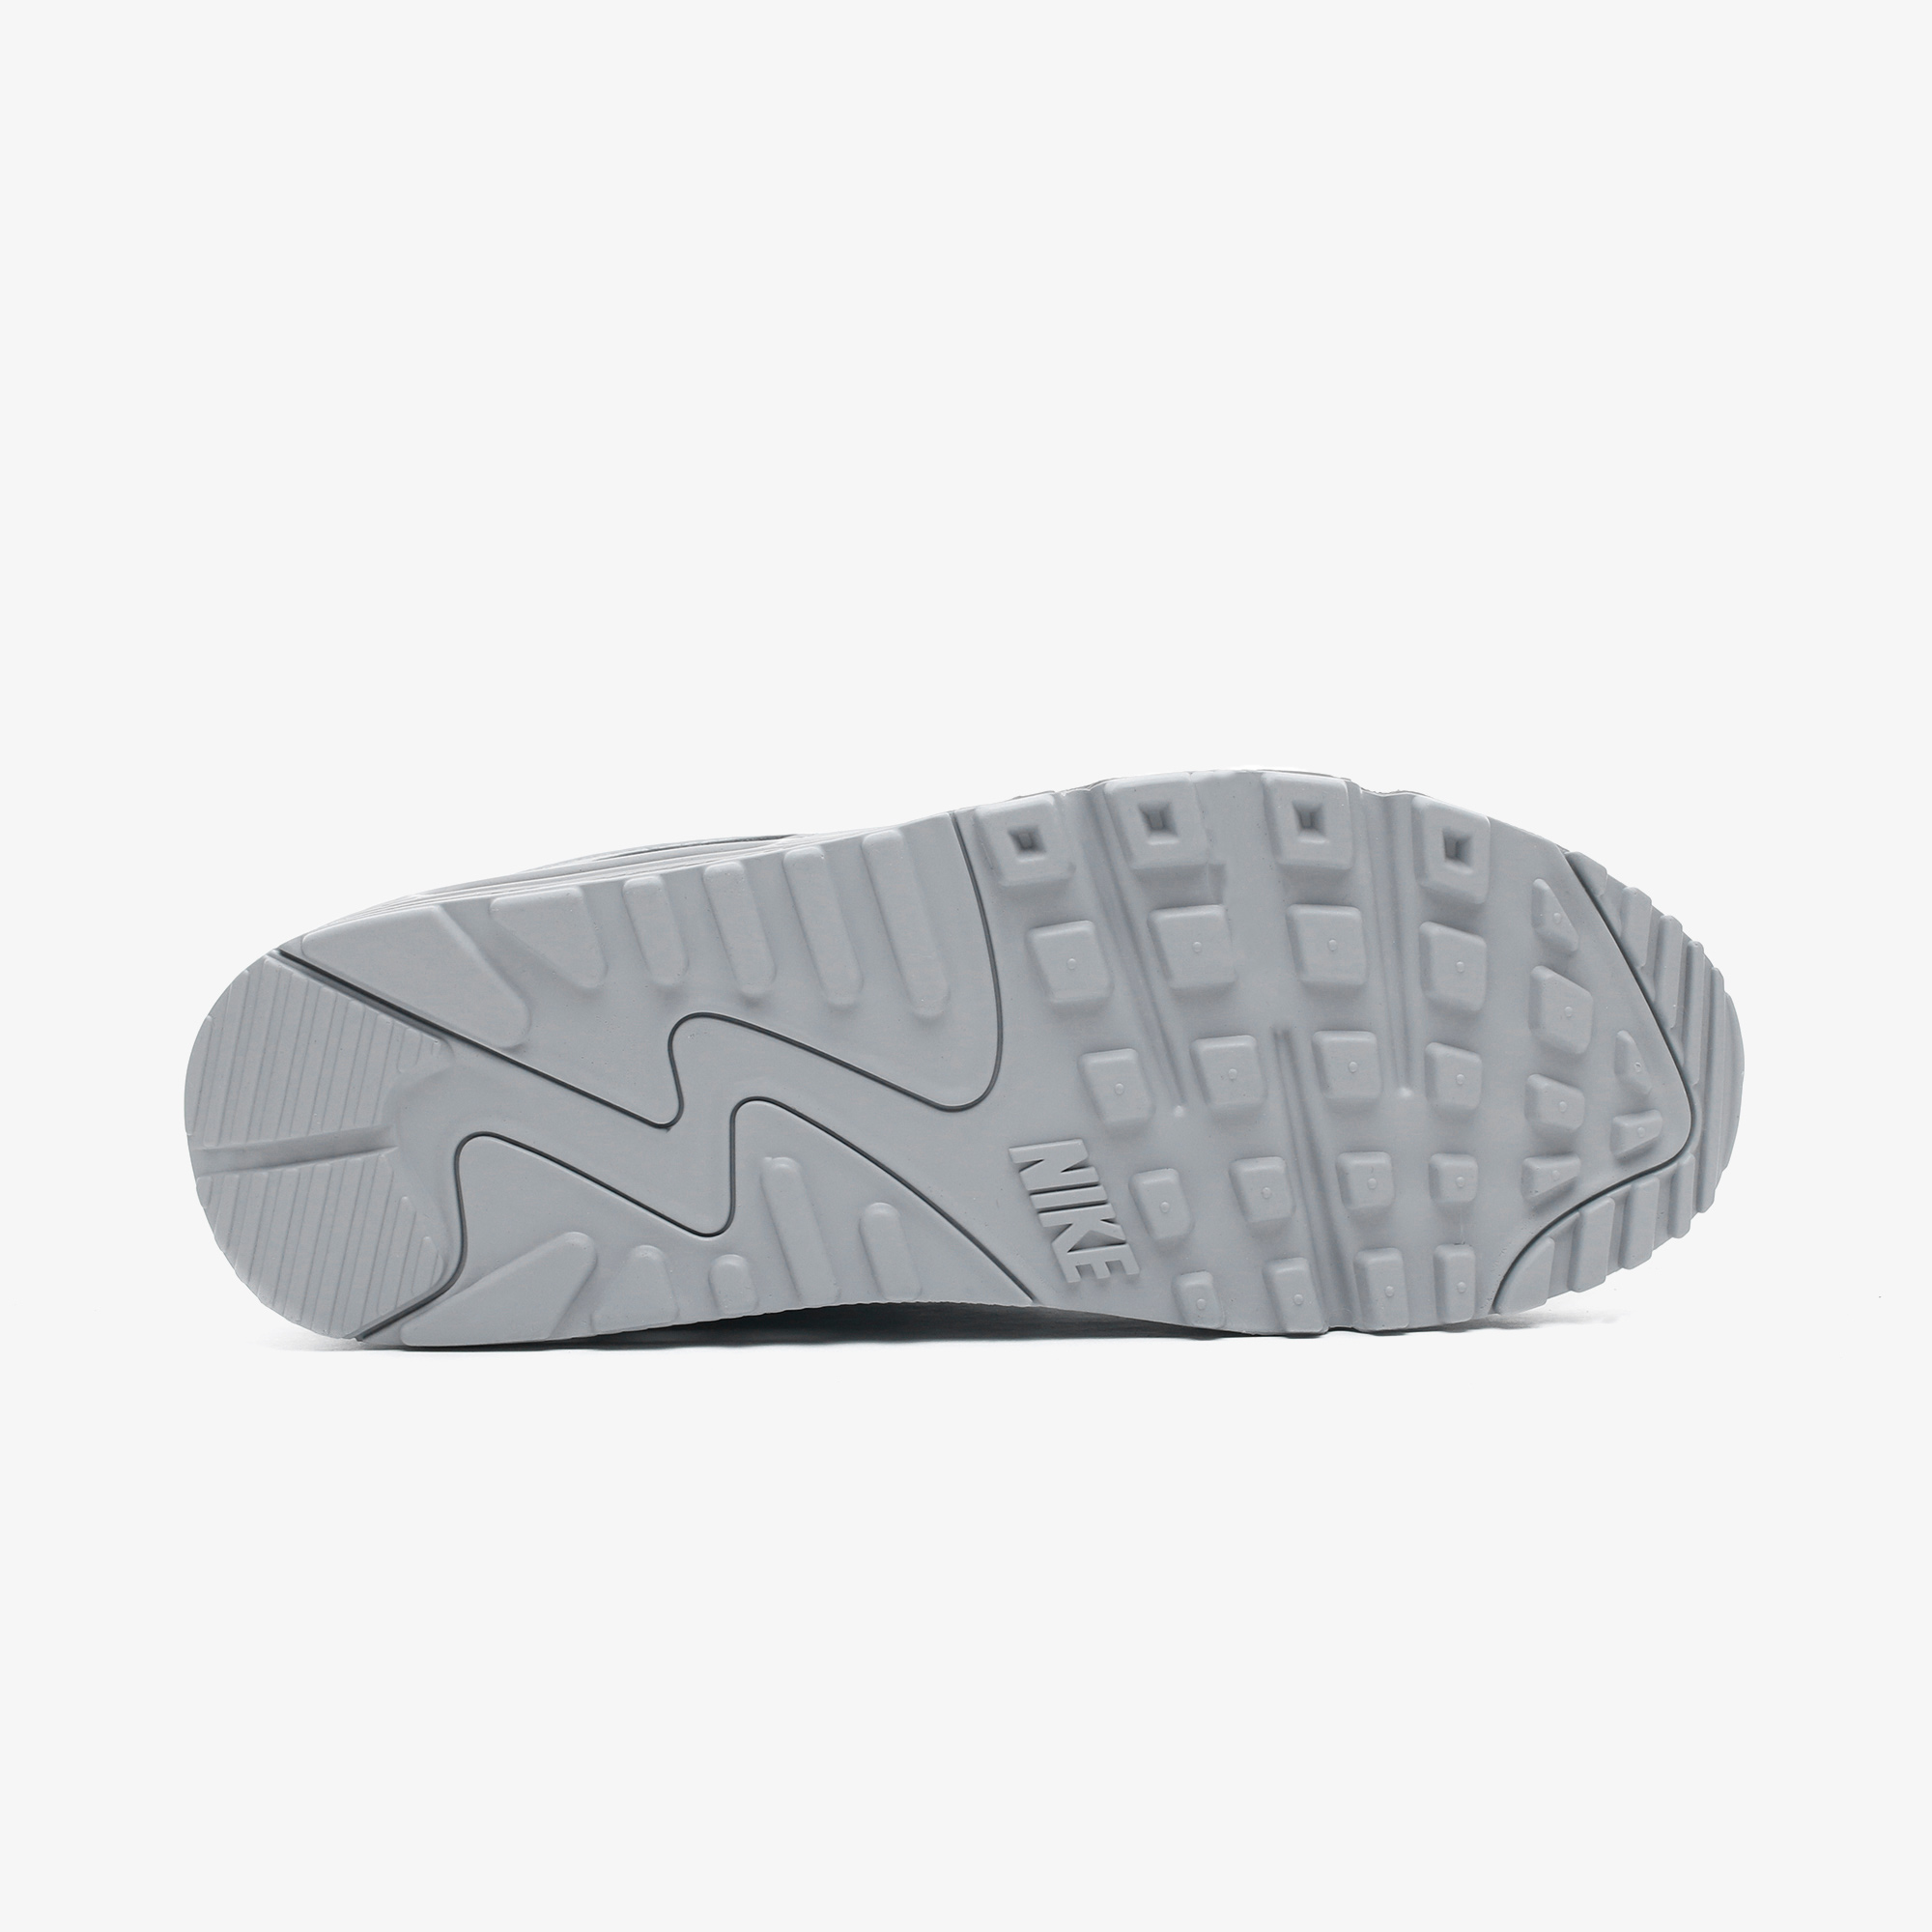 Nike Air Max 90 Erkek Gri Spor Ayakkabı